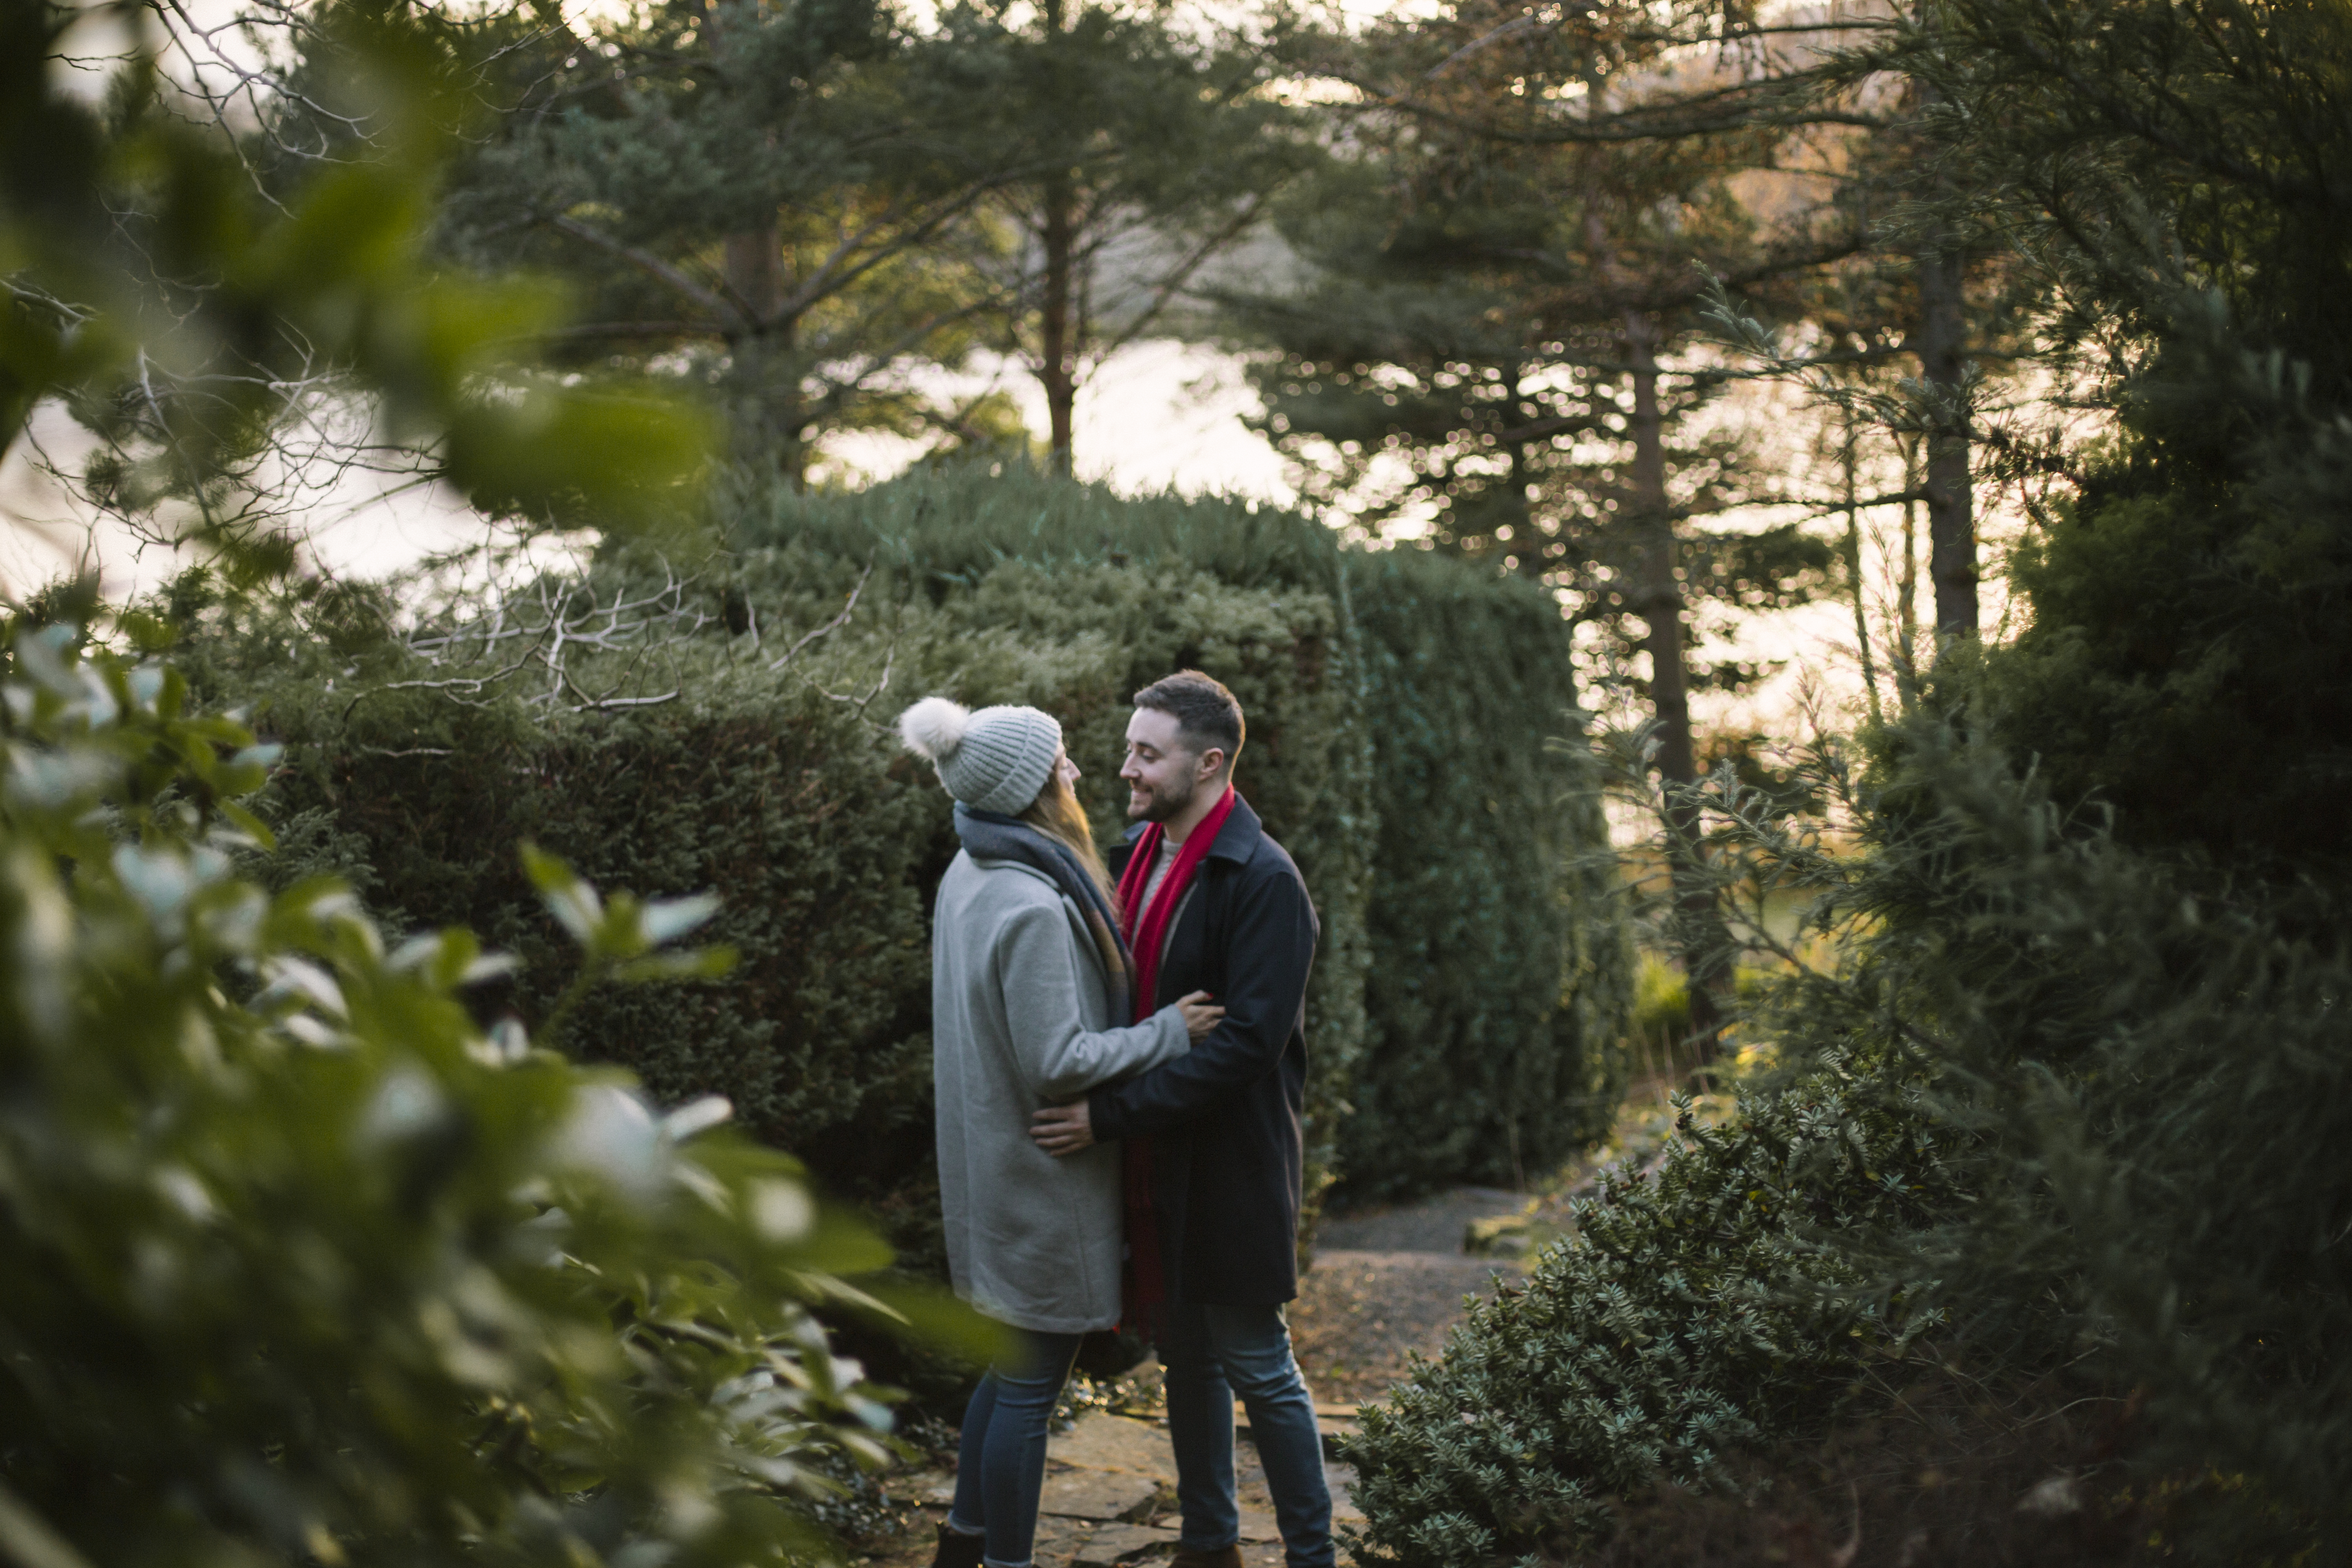 Edinburgh Surprise Wedding Proposal at Dr Neils Garden, Duddingston | Scottish Engagement Photographer